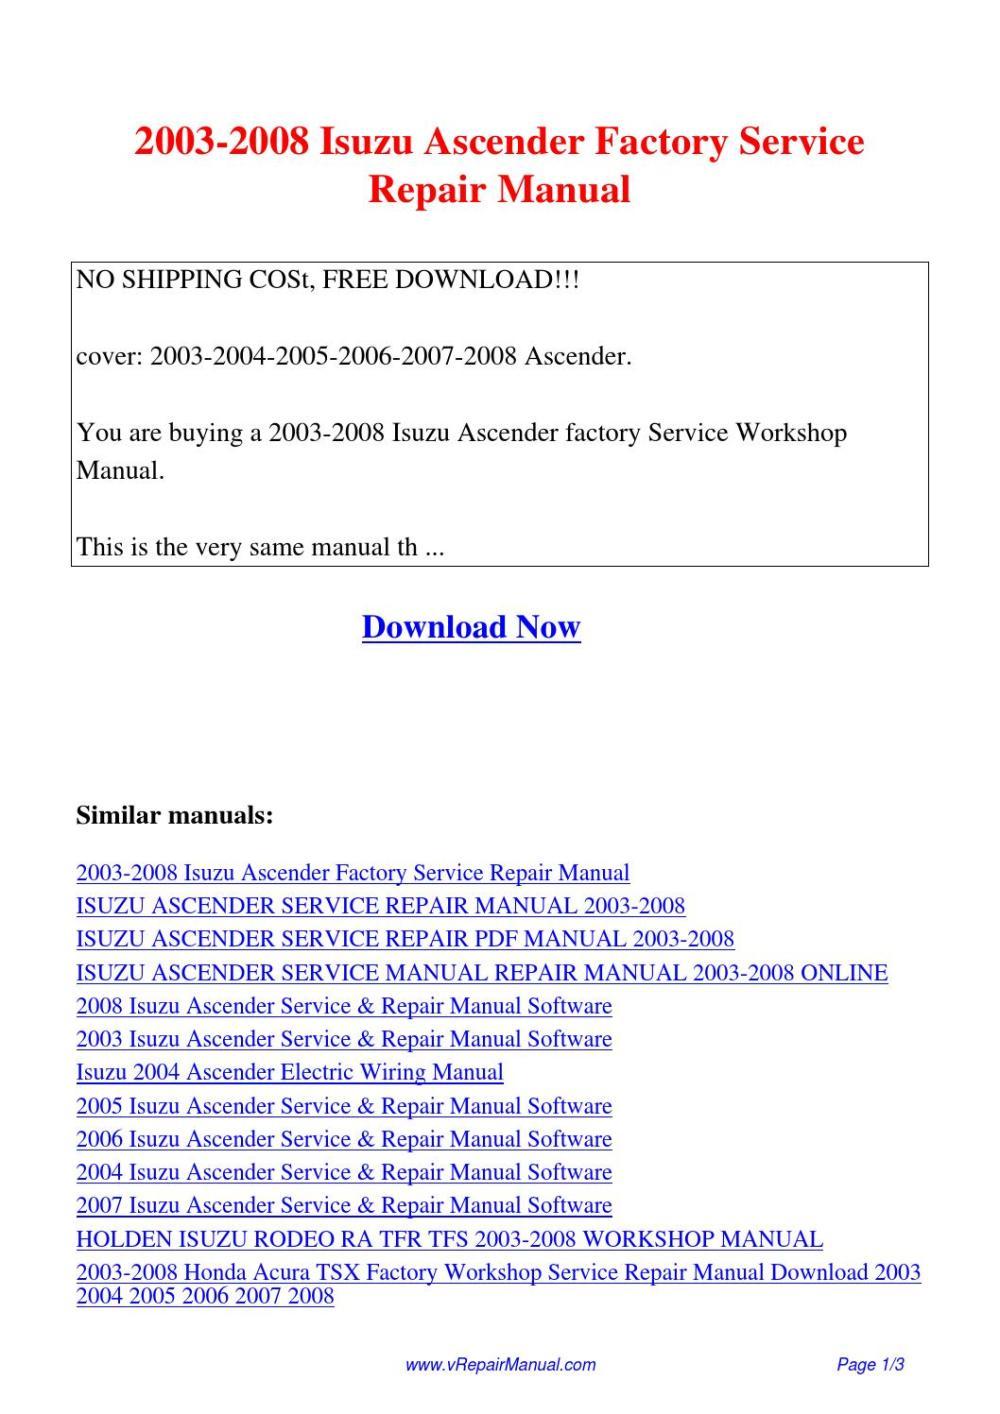 medium resolution of 2003 2008 isuzu ascender factory service repair manual pdf by david zhang issuu